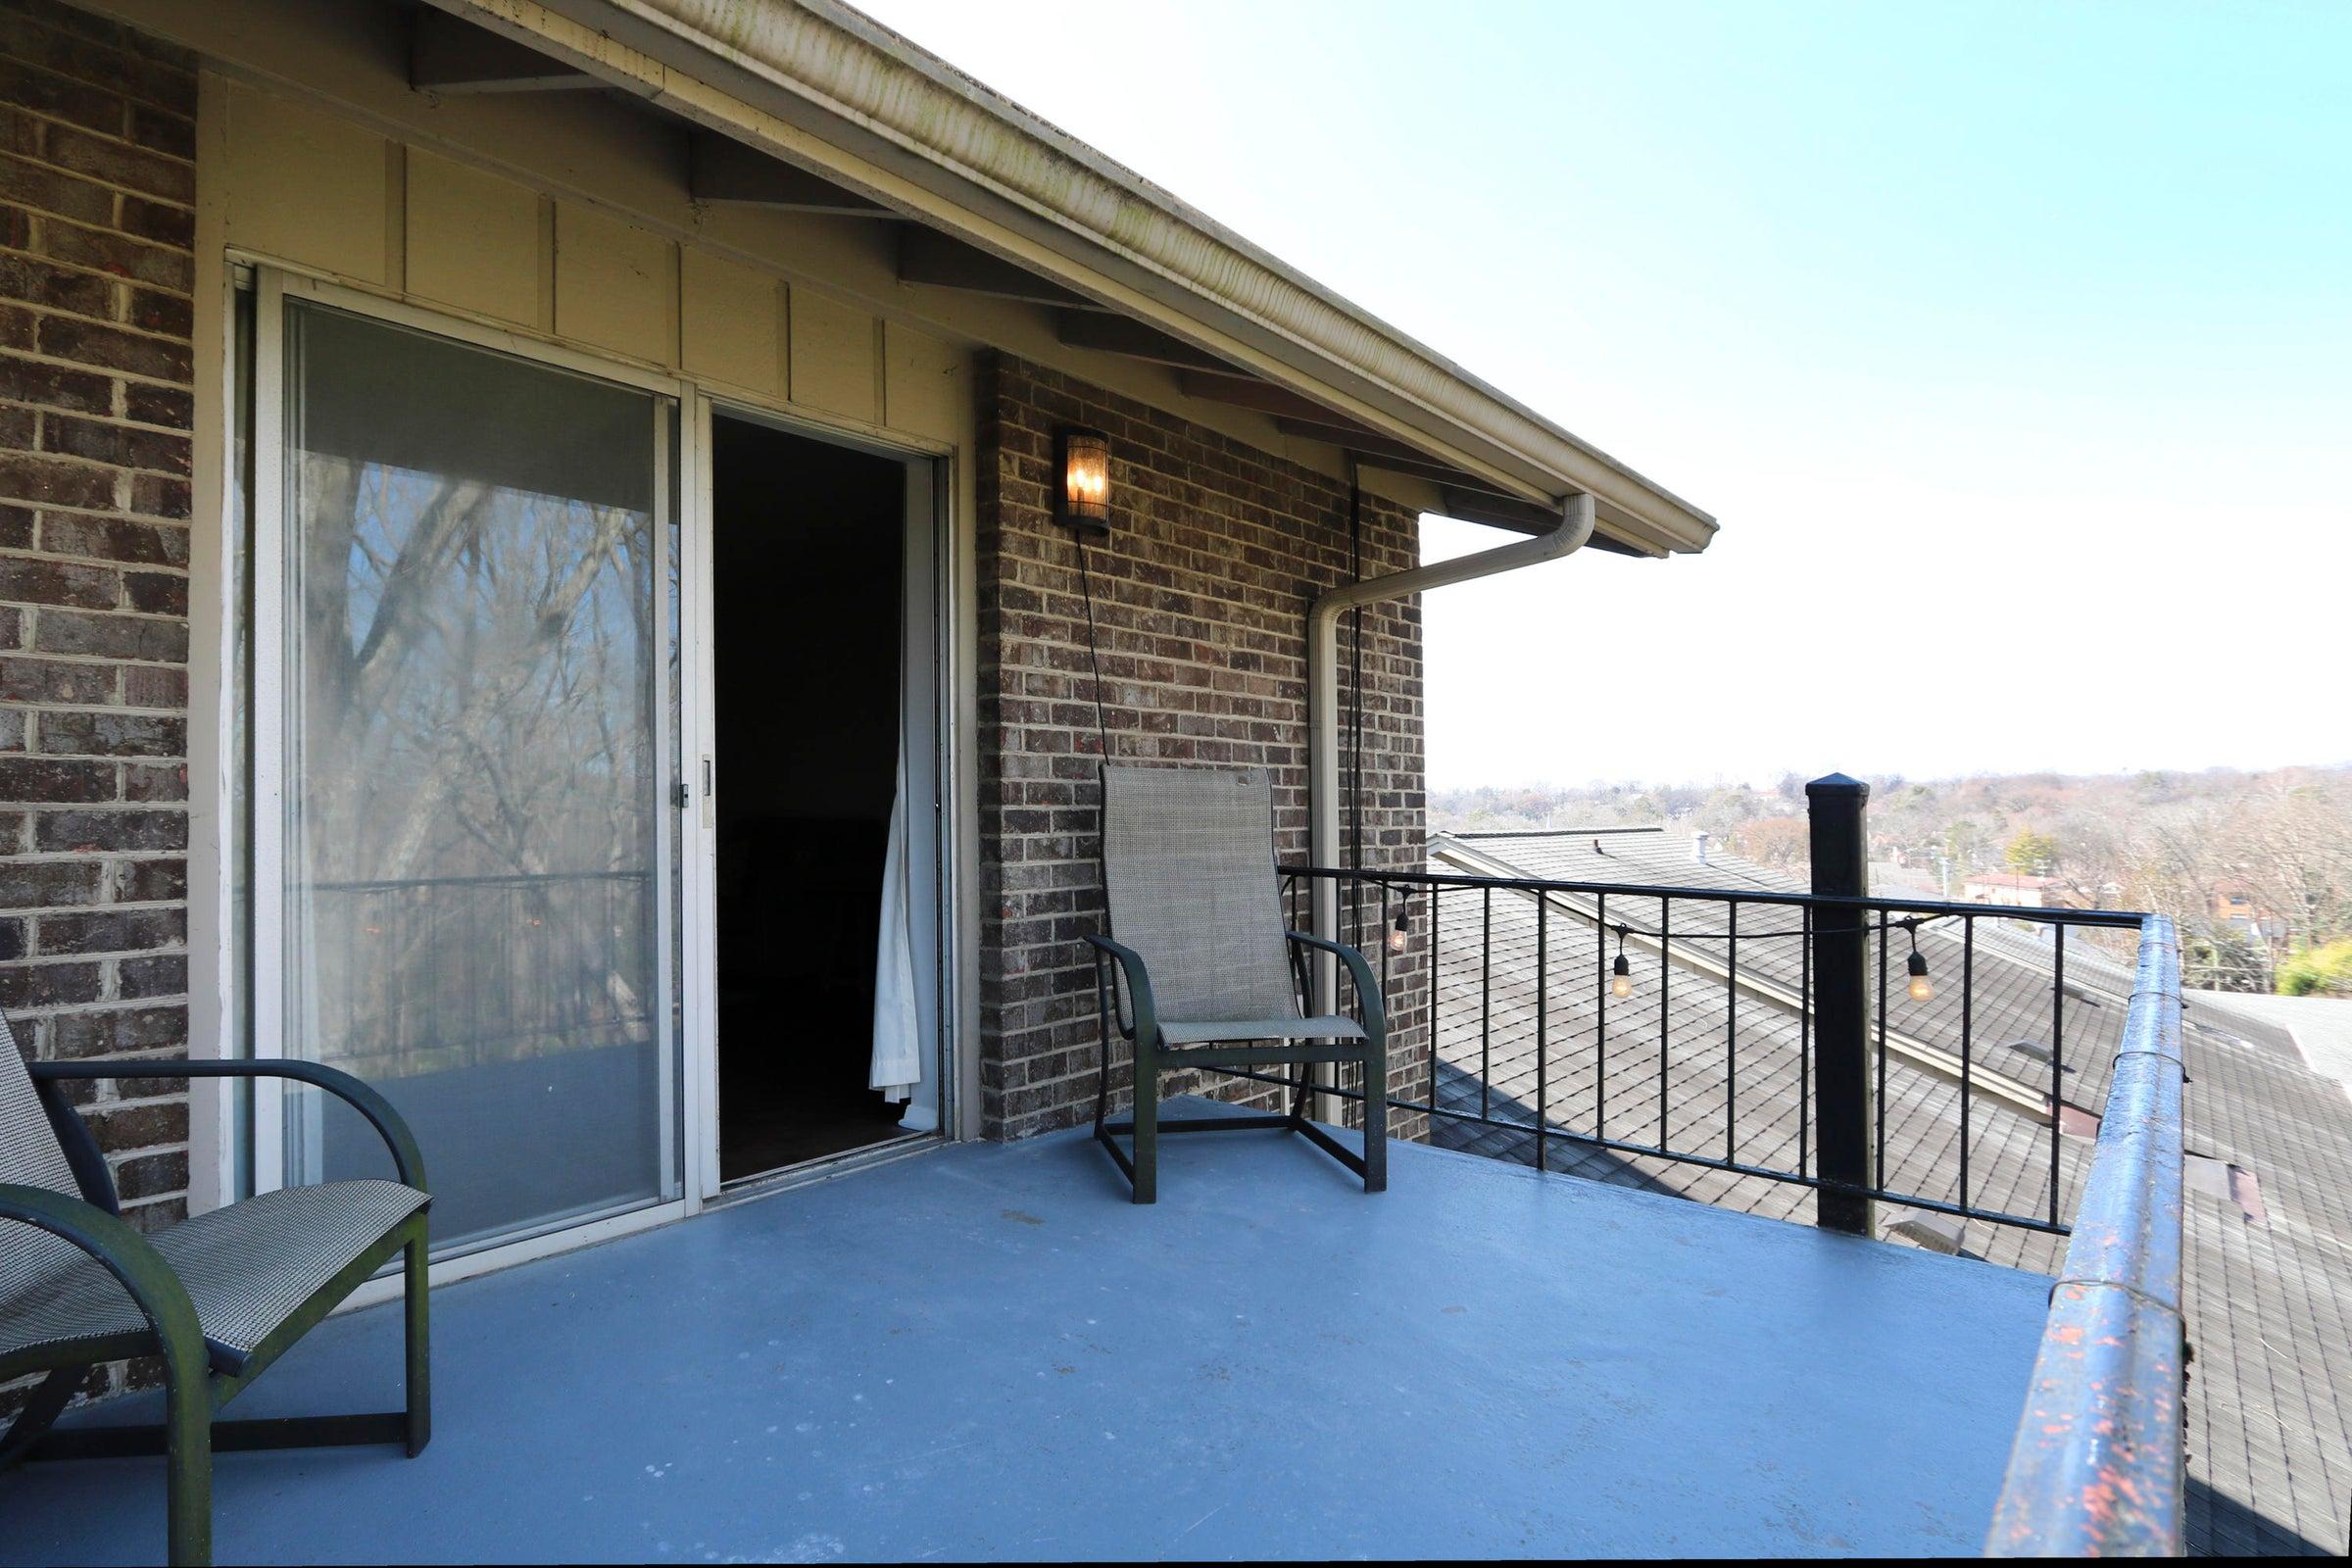 10_Balcony Deck View 3